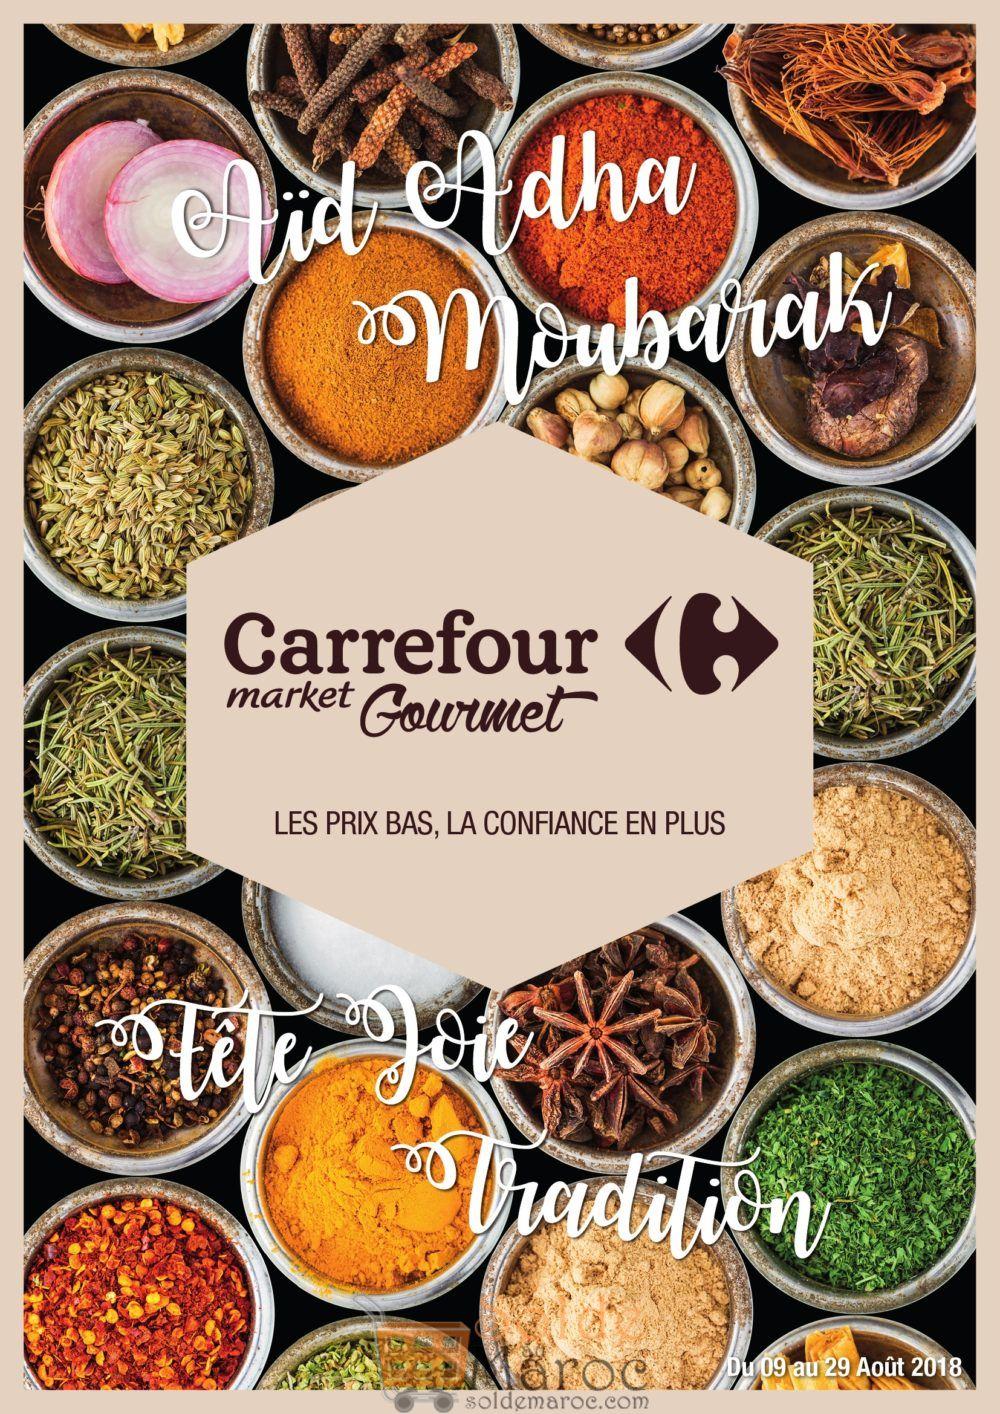 Catalogue Carrefour Gourmet Spéciale عيد الأضحى du 9 au 29 Août 2018